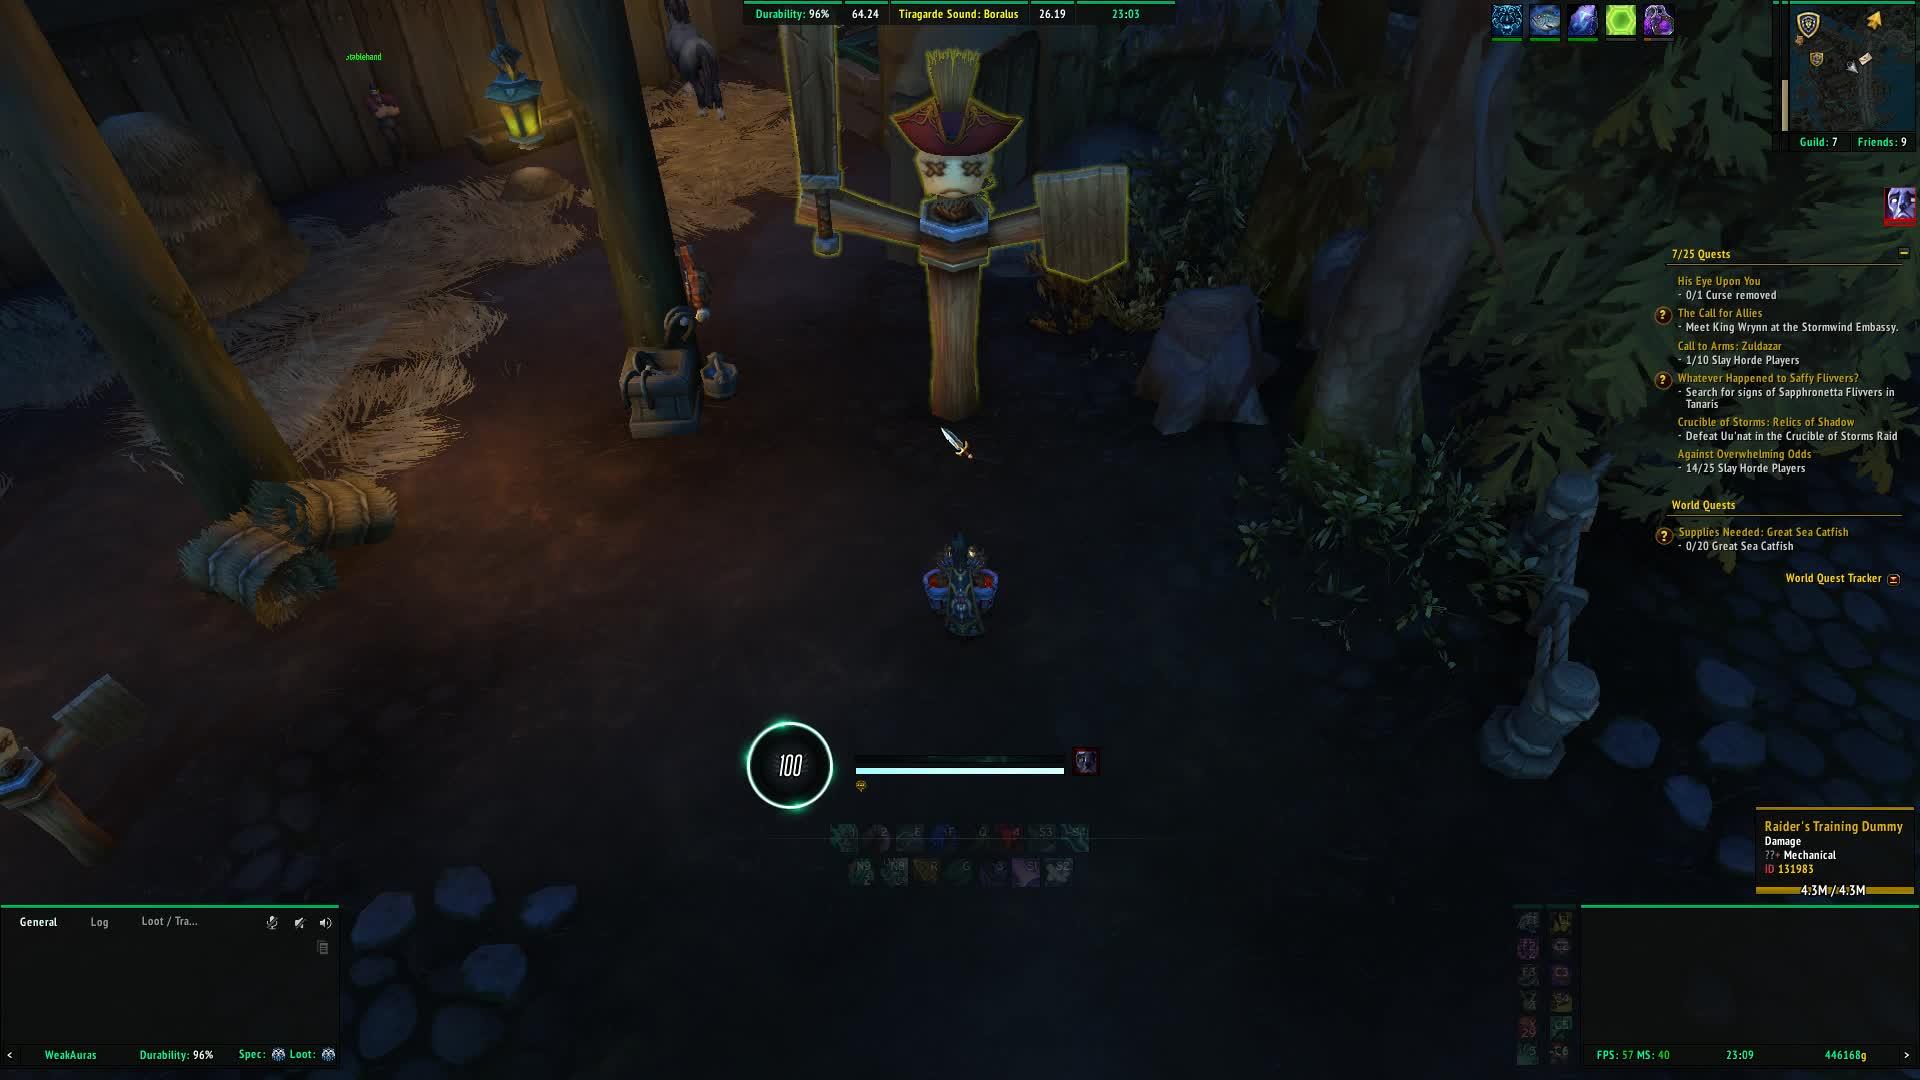 worldofwarcraft, World Of Warcraft 2019.04.14 - 23.09.46.18 GIFs